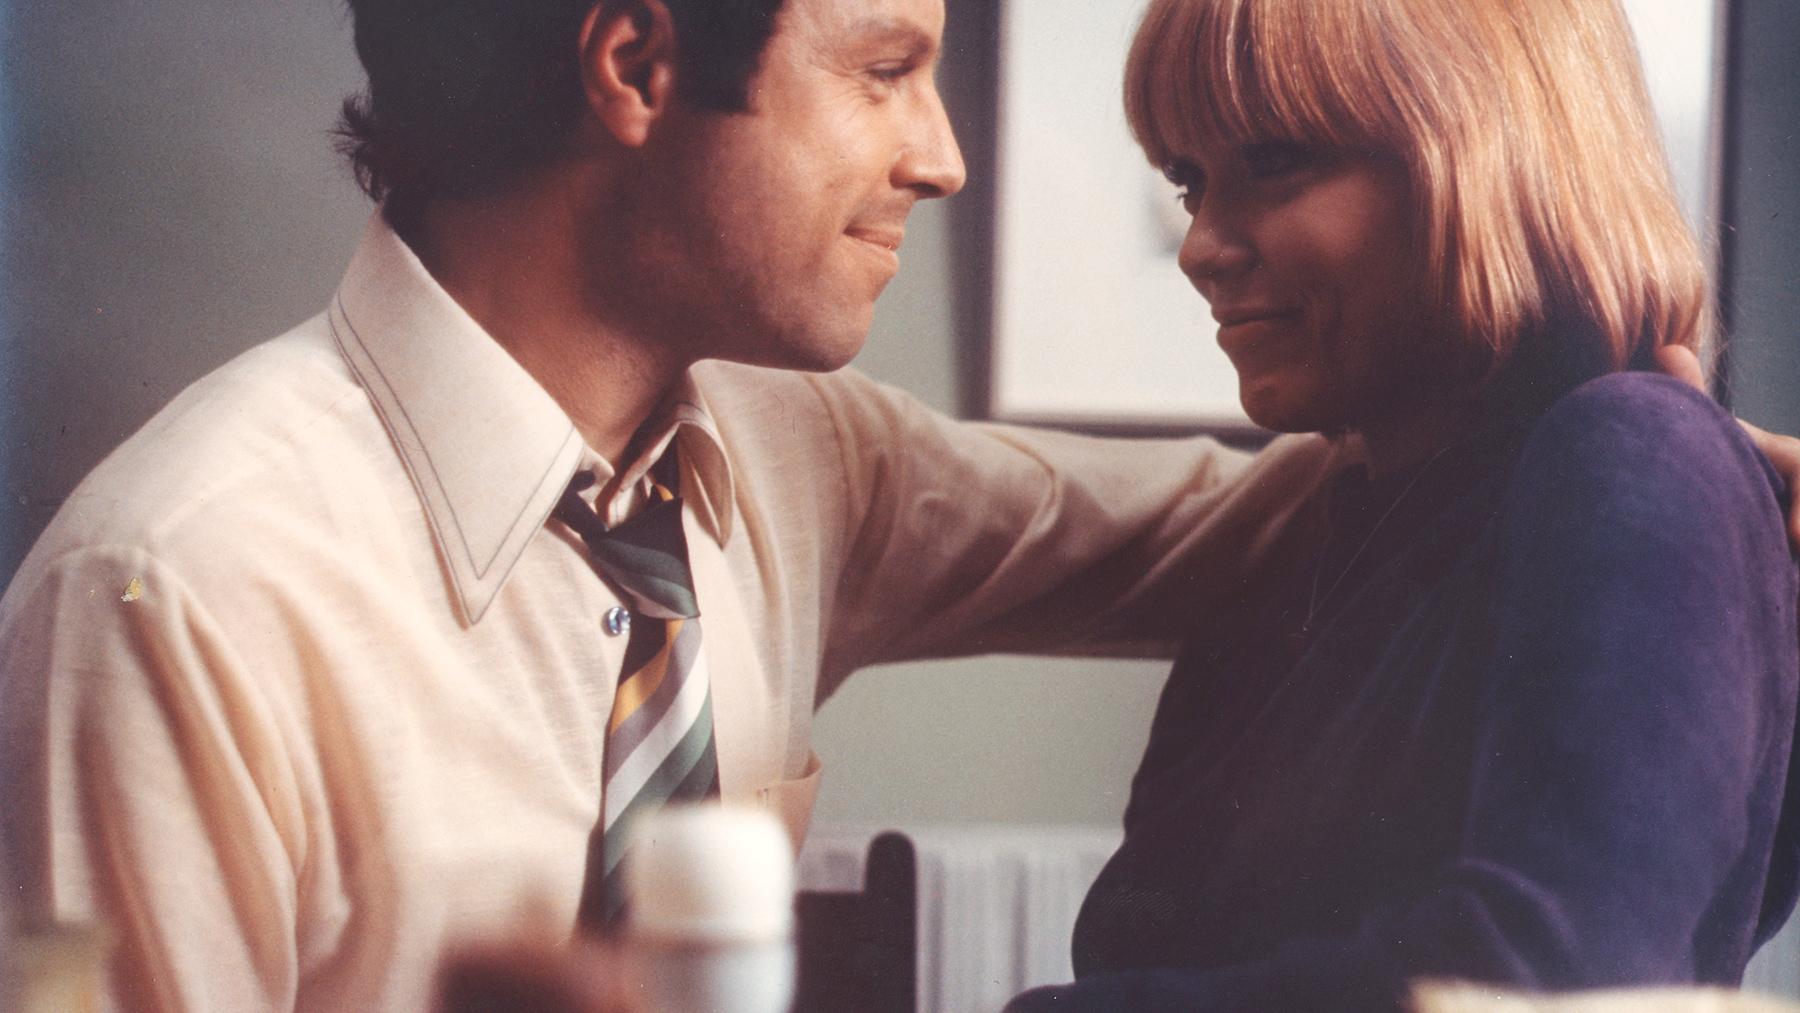 introduktion dating matchmaking universitet